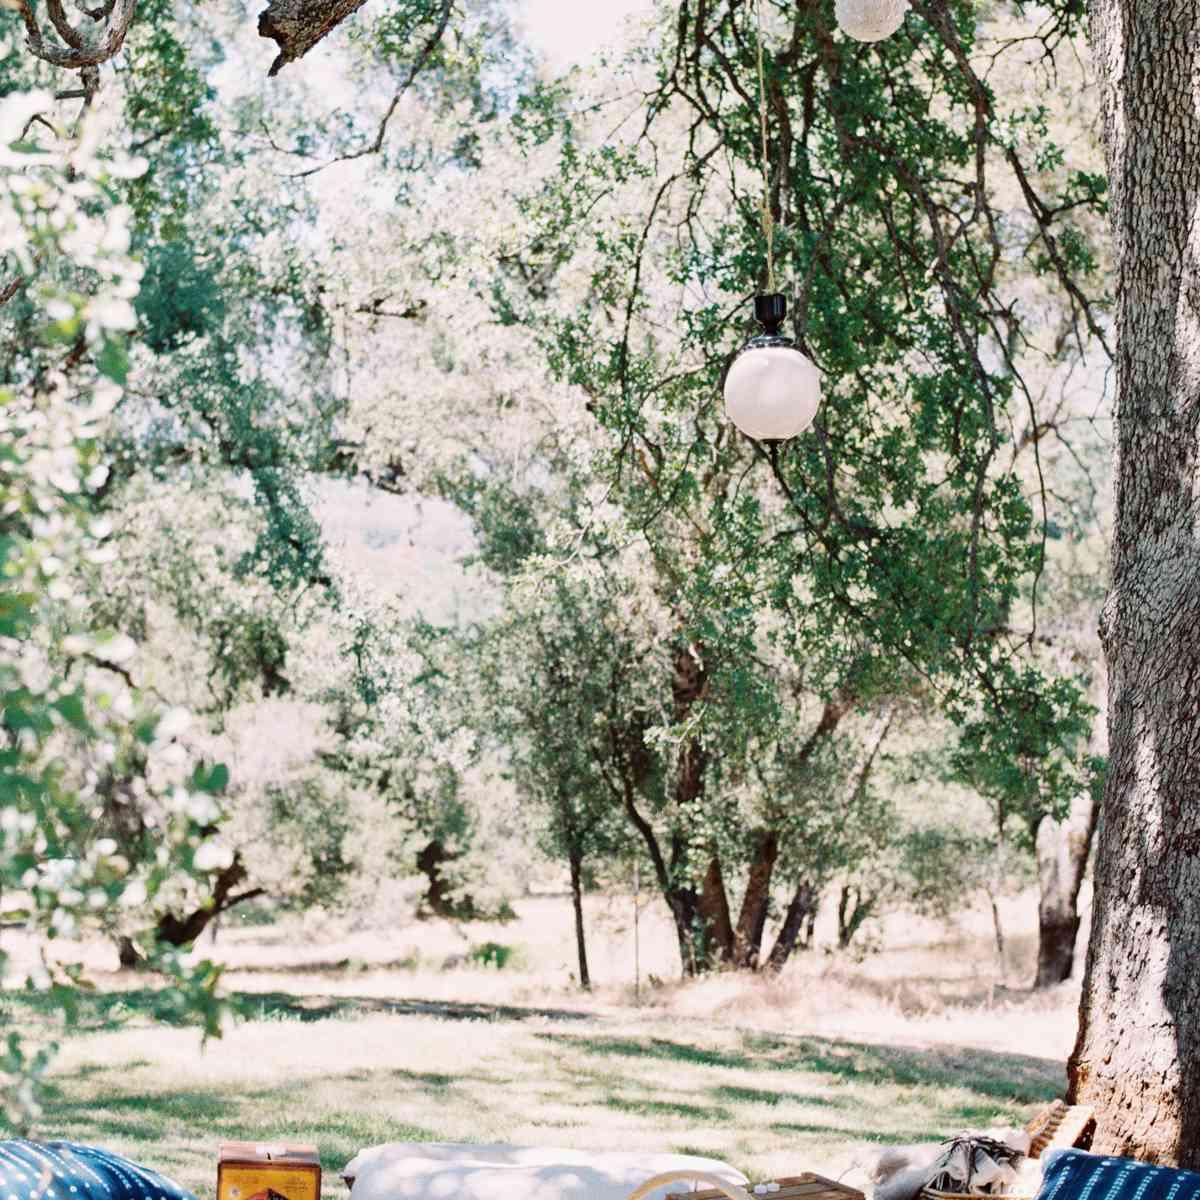 outdoor picnic spot